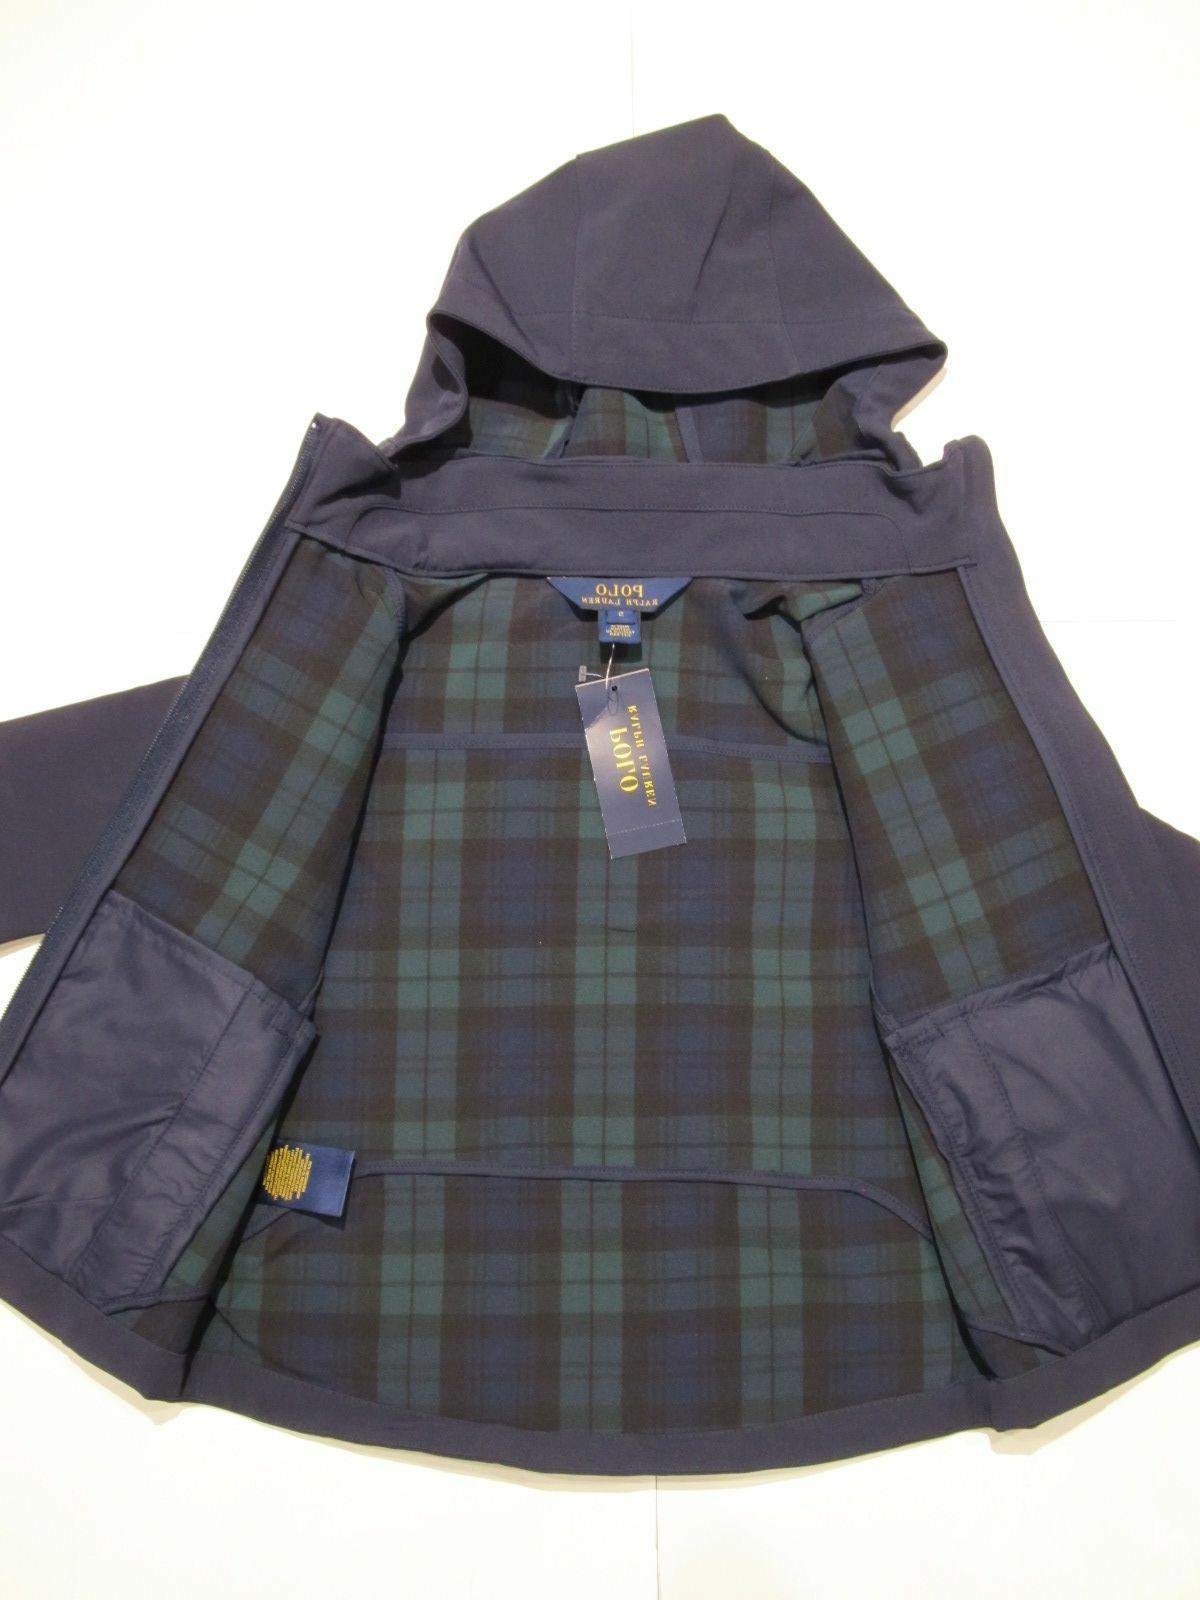 New Boys Lauren Hooded Packable Rain Jacket L